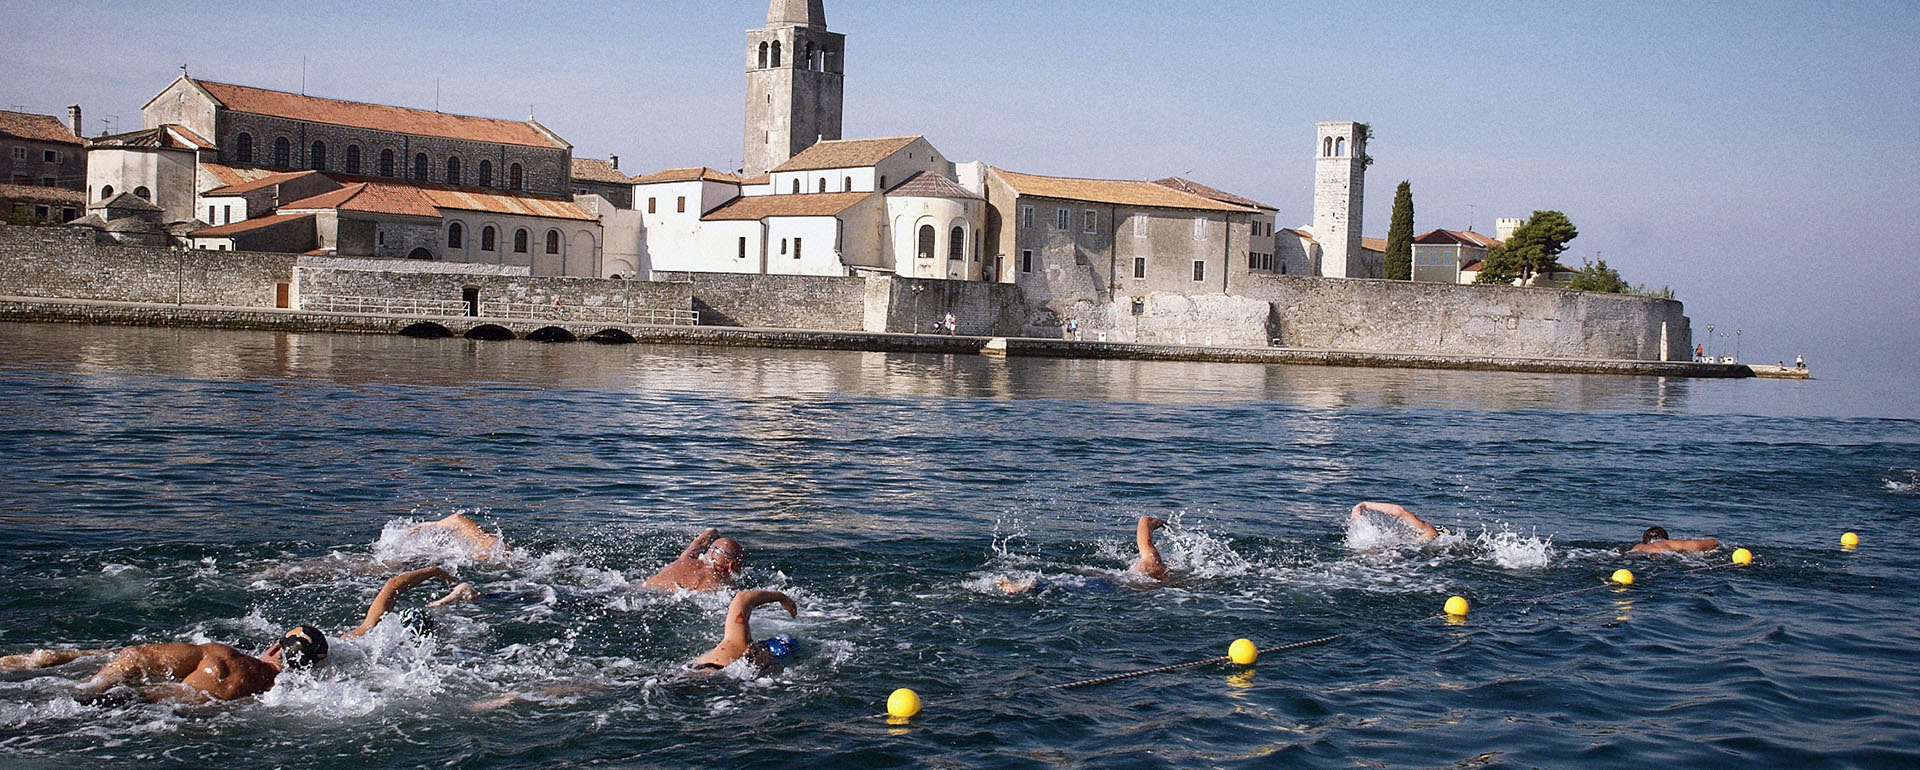 Porecki Delfin - a swimming chalenge for everyone